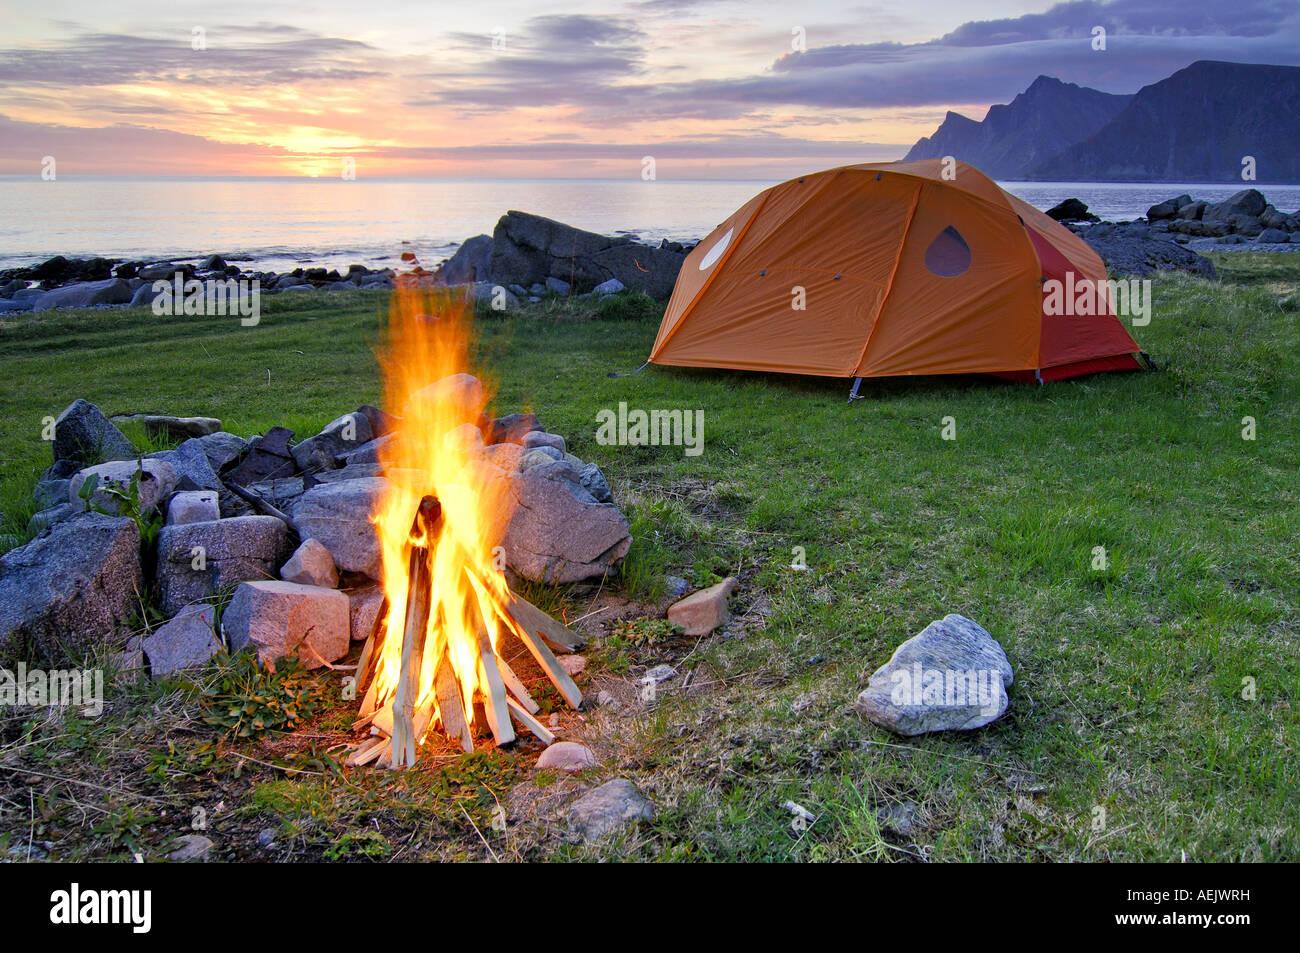 Fogata con carpa, sol de medianoche, Austvagoy, Lofoten, Noruega, Escandinavia, Europa Imagen De Stock